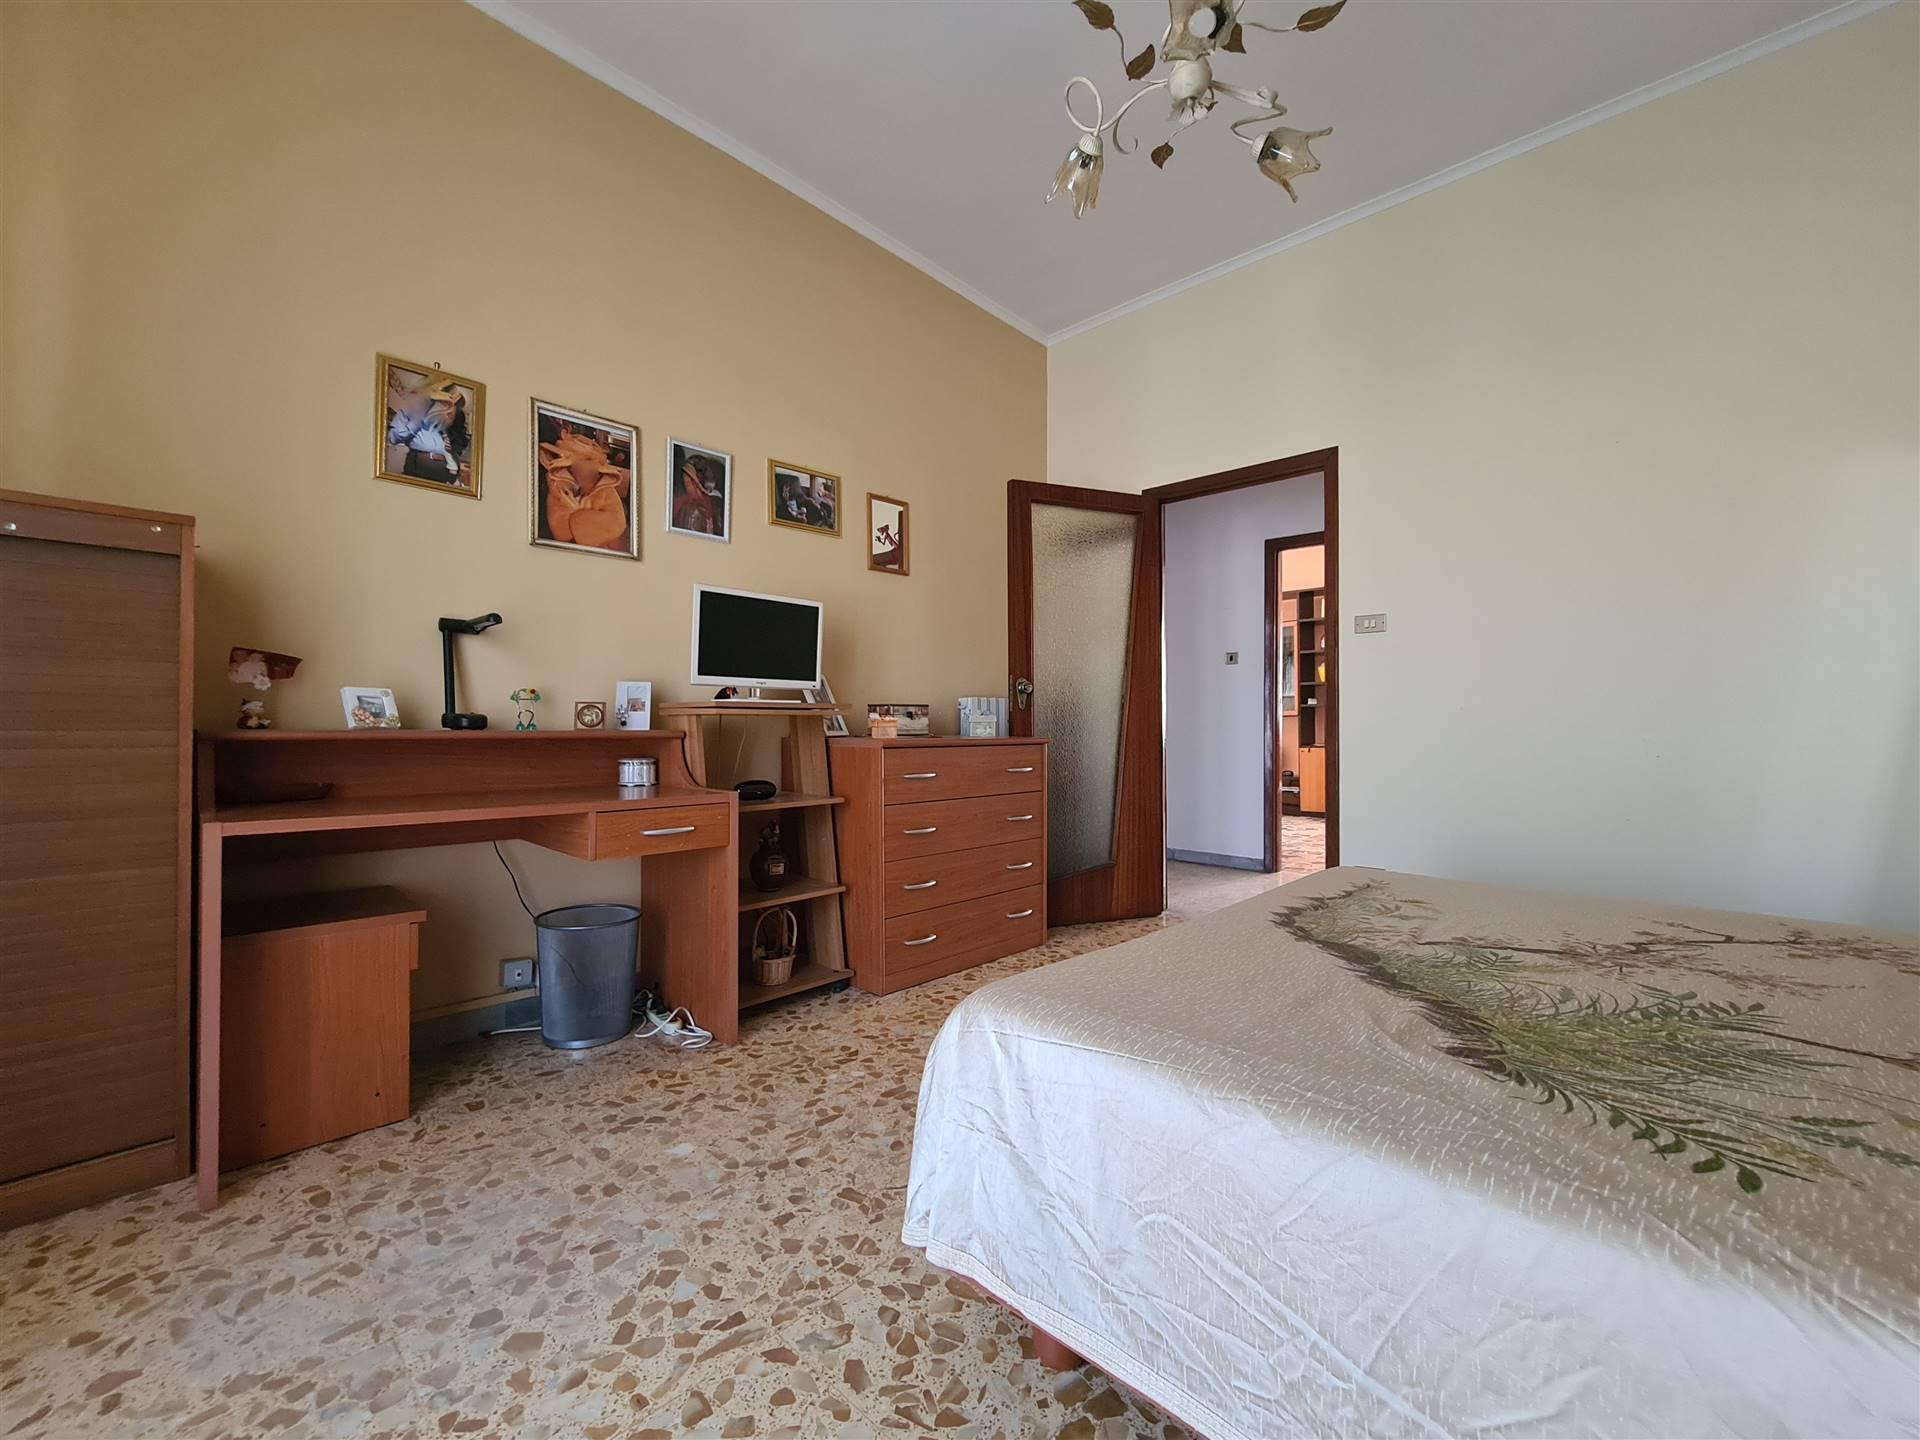 AV924B-Appartamento-SANTA-MARIA-CAPUA-VETERE-Via-Luigi-de-Michele